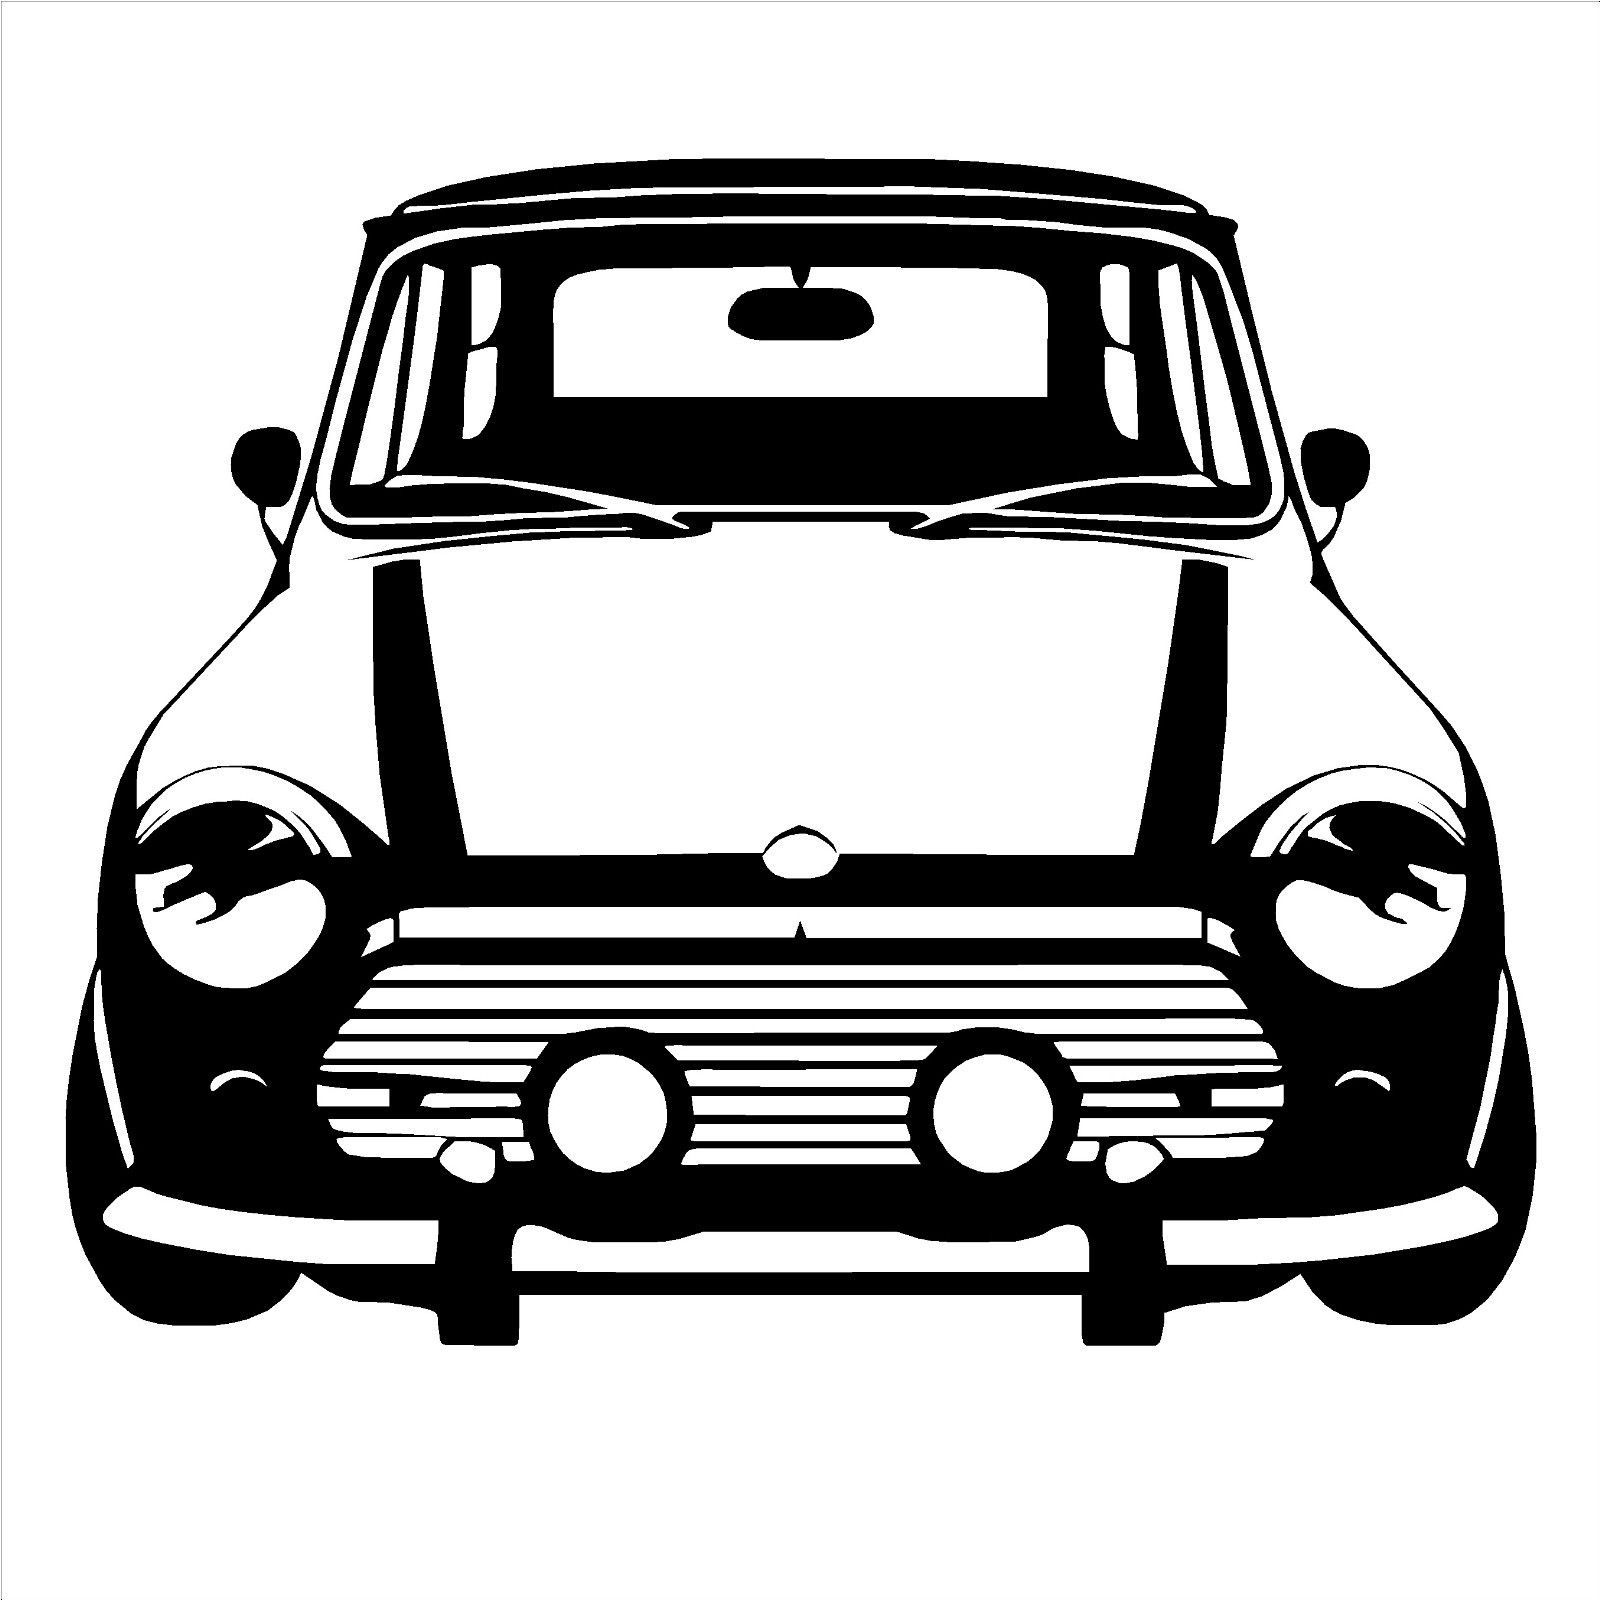 Details about CLASSIC MINI COOPER Vinyl Wall Art car